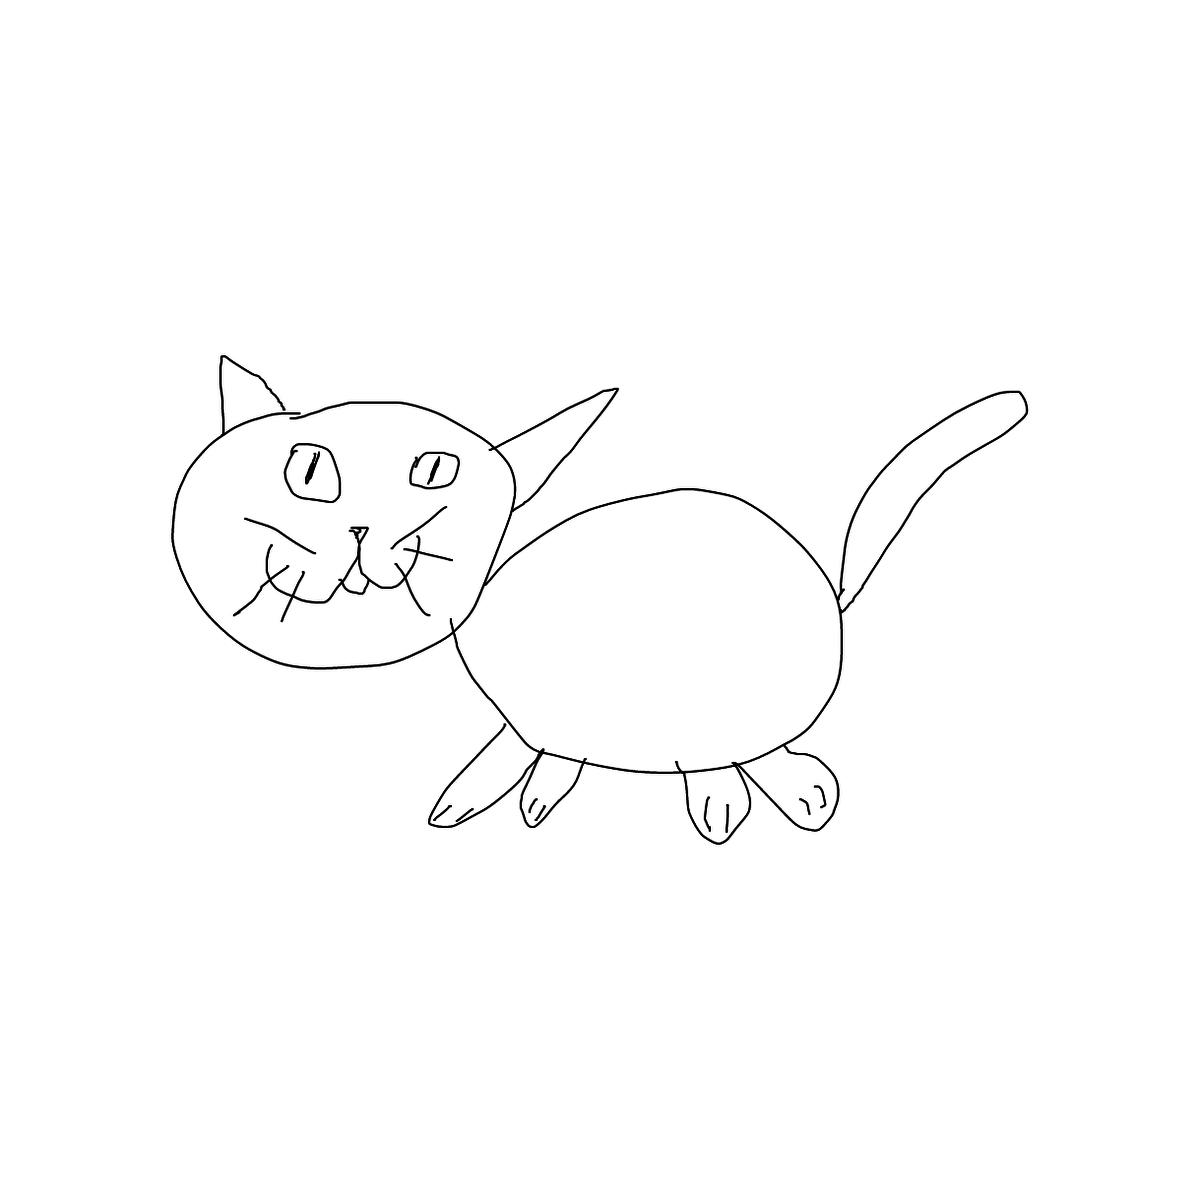 BAAAM drawing#15872 lat:50.5648345947265600lng: 21.1734523773193360